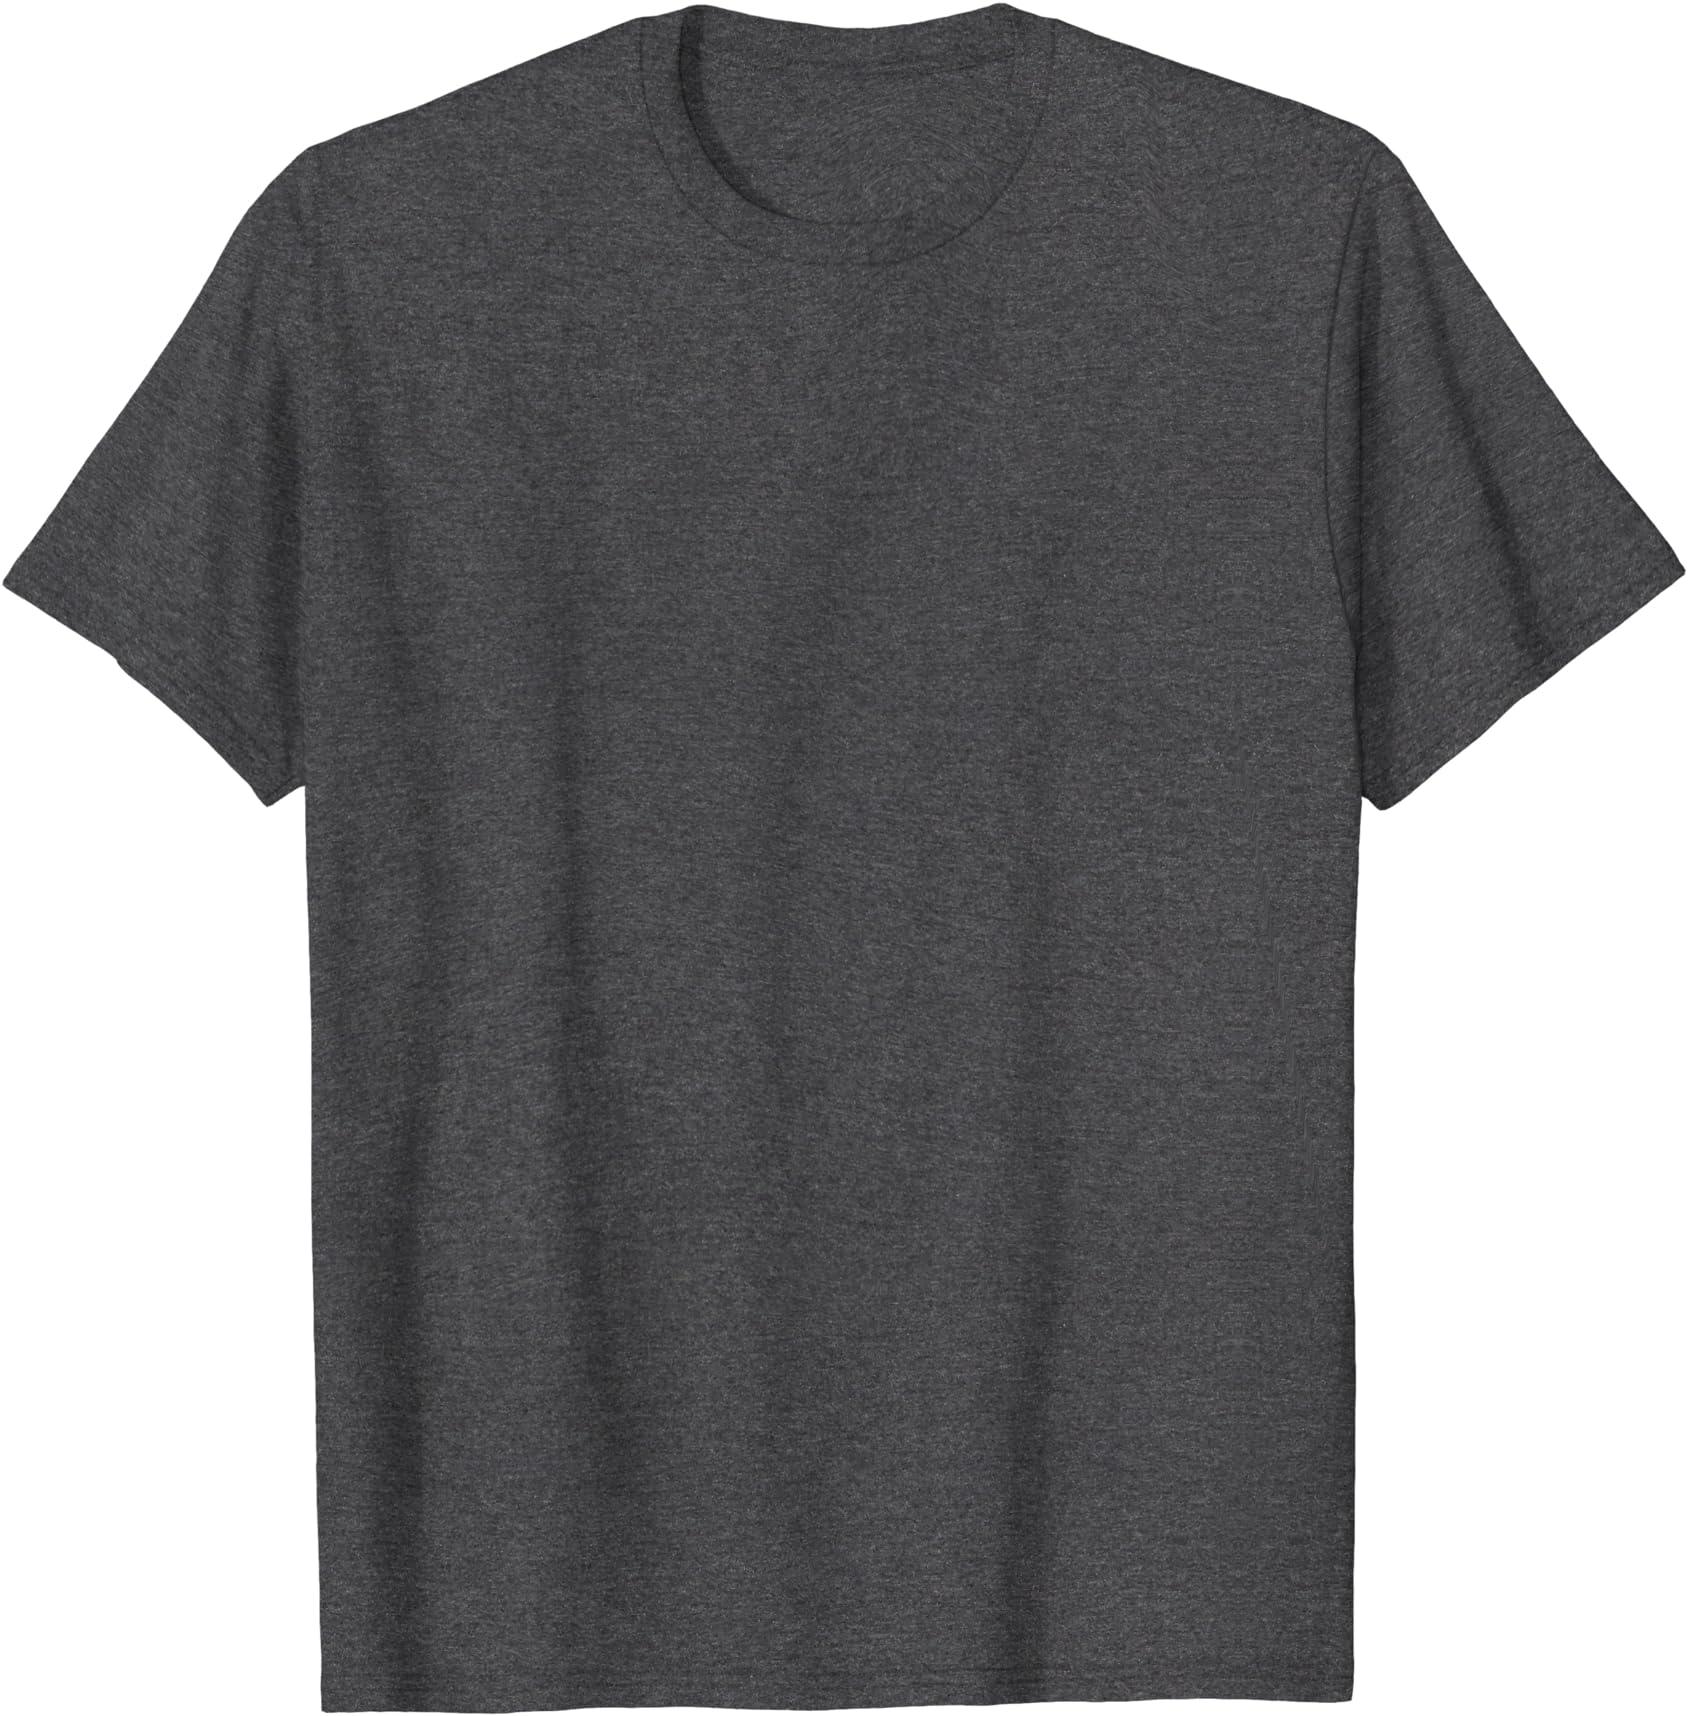 Asking Alexandria Boys Girls Funny Graphic T Shirt Kids Youth Short Sleeve Tee Shirts